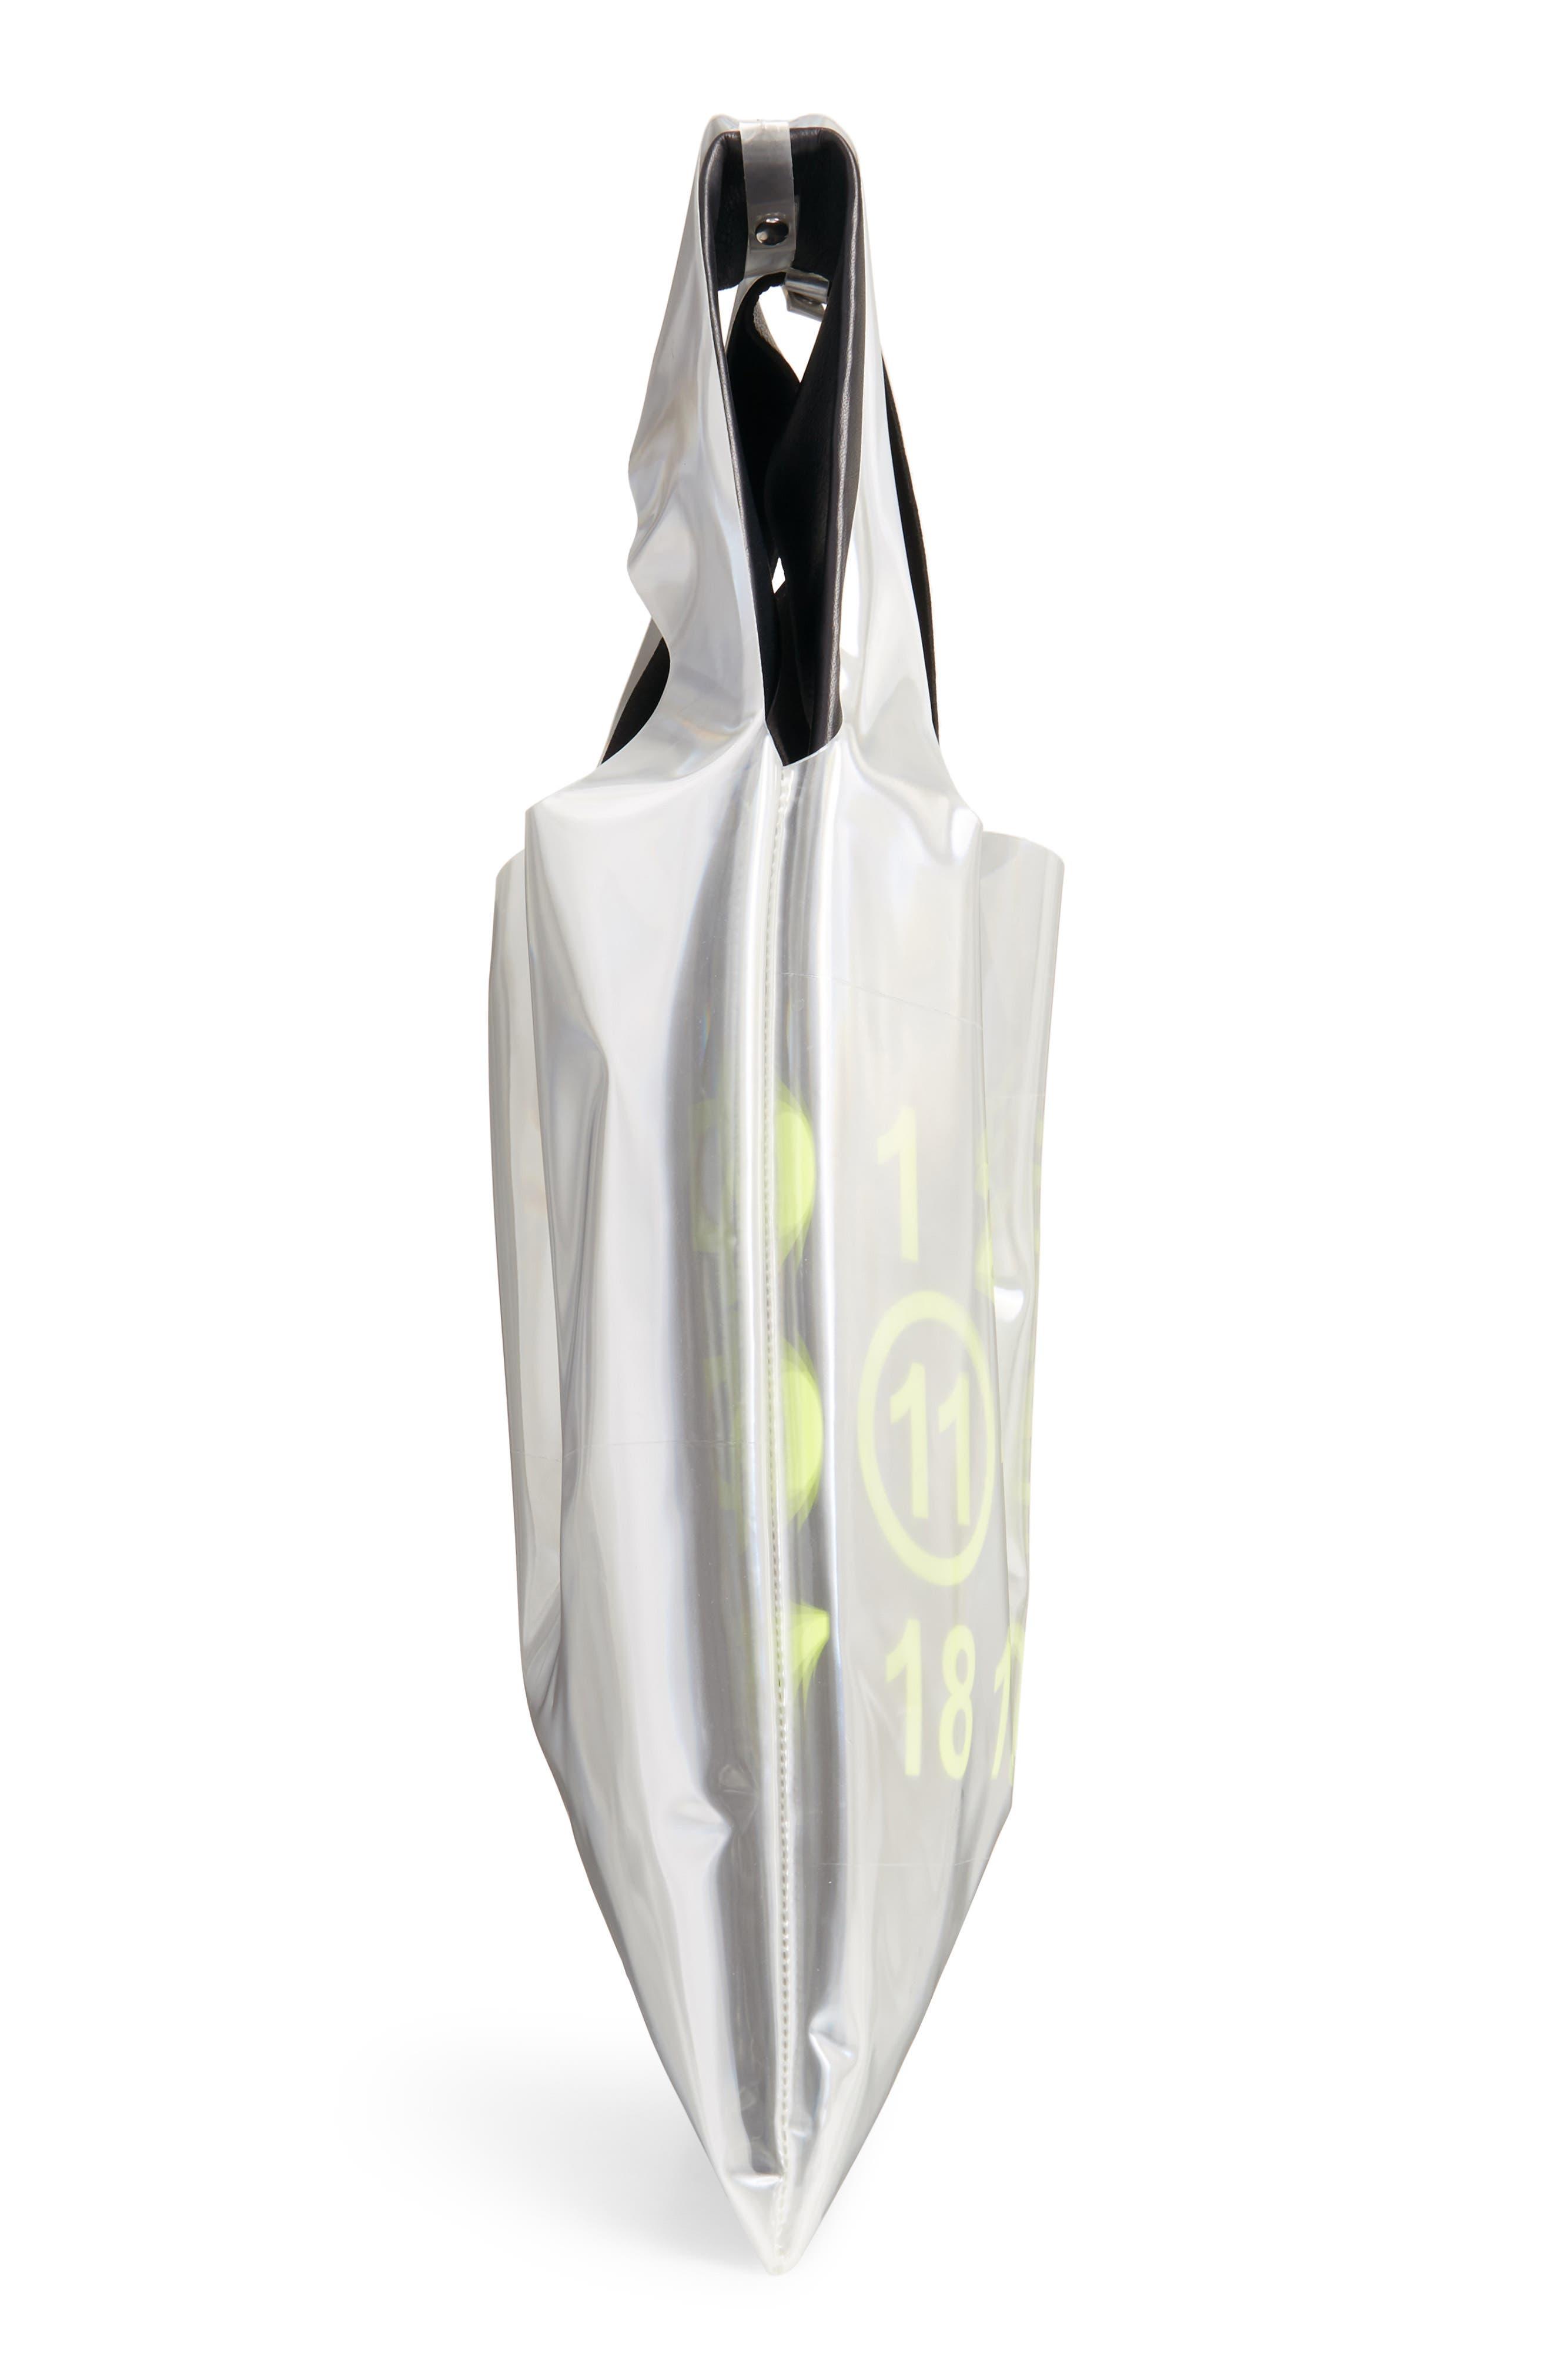 PVC & Leather Shopper Bag,                             Alternate thumbnail 5, color,                             BLACK/ YELLOW FLUO